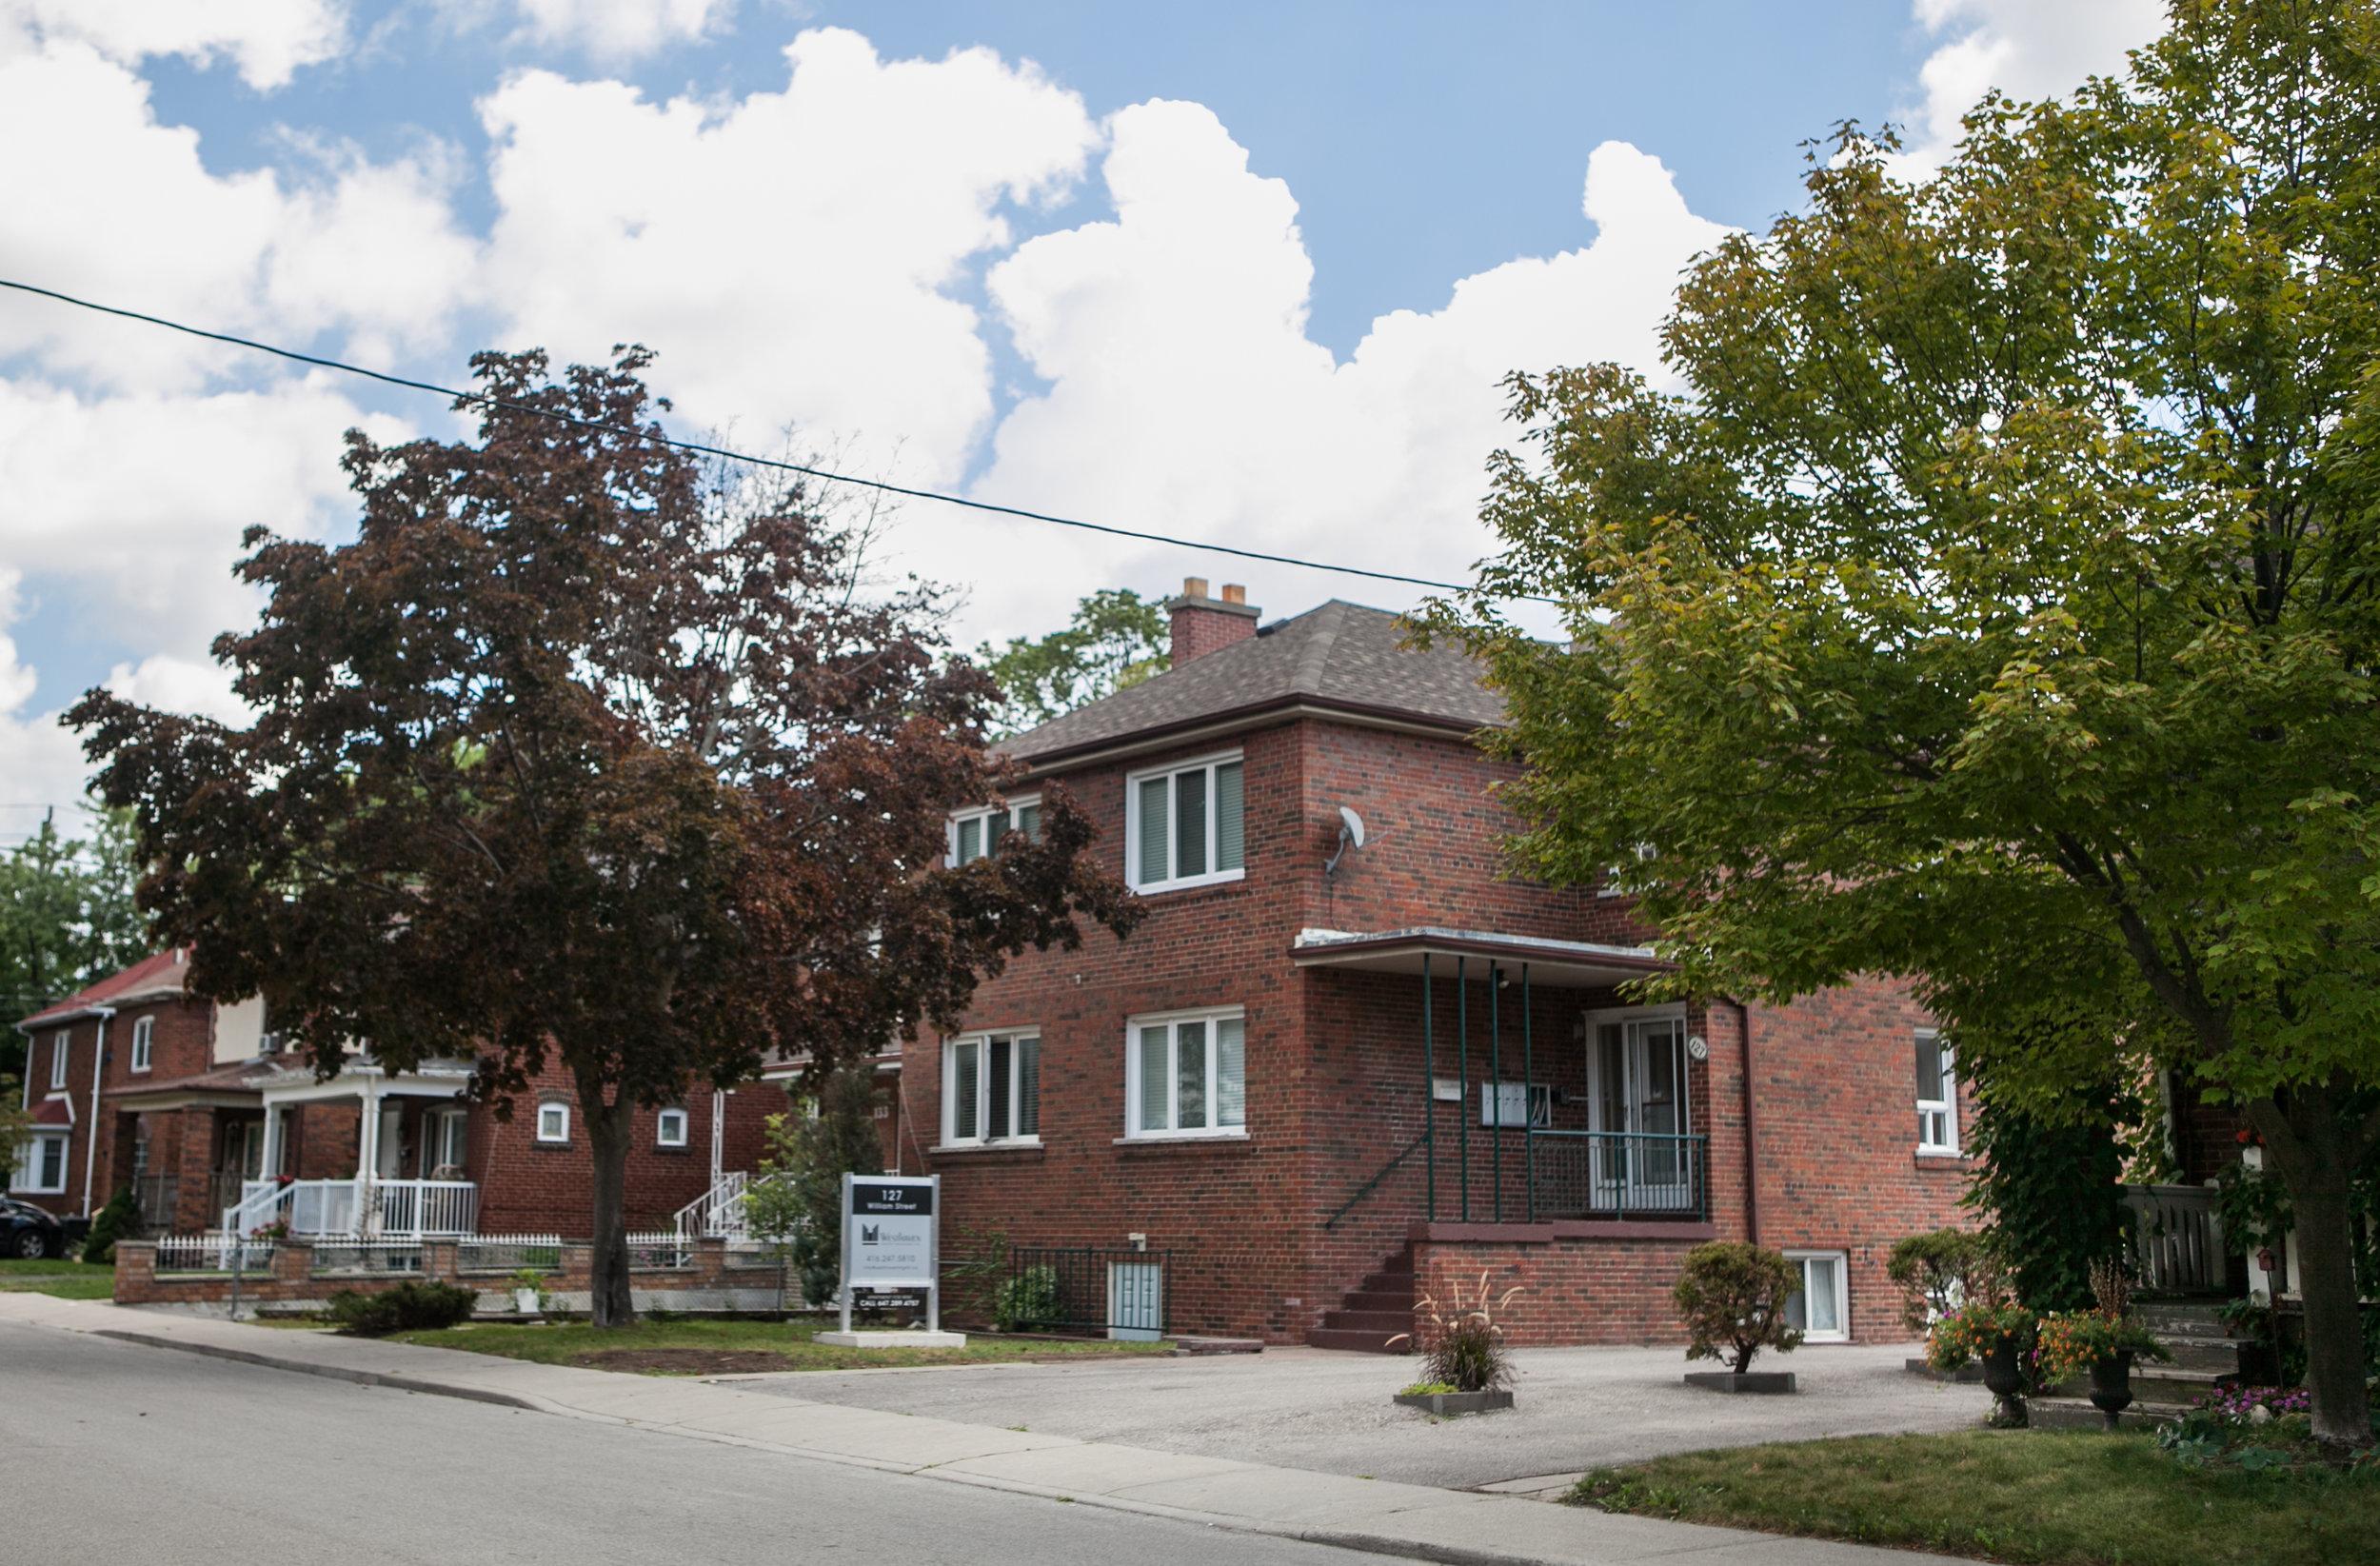 toronto-residential-property-management-127-william-street.jpg